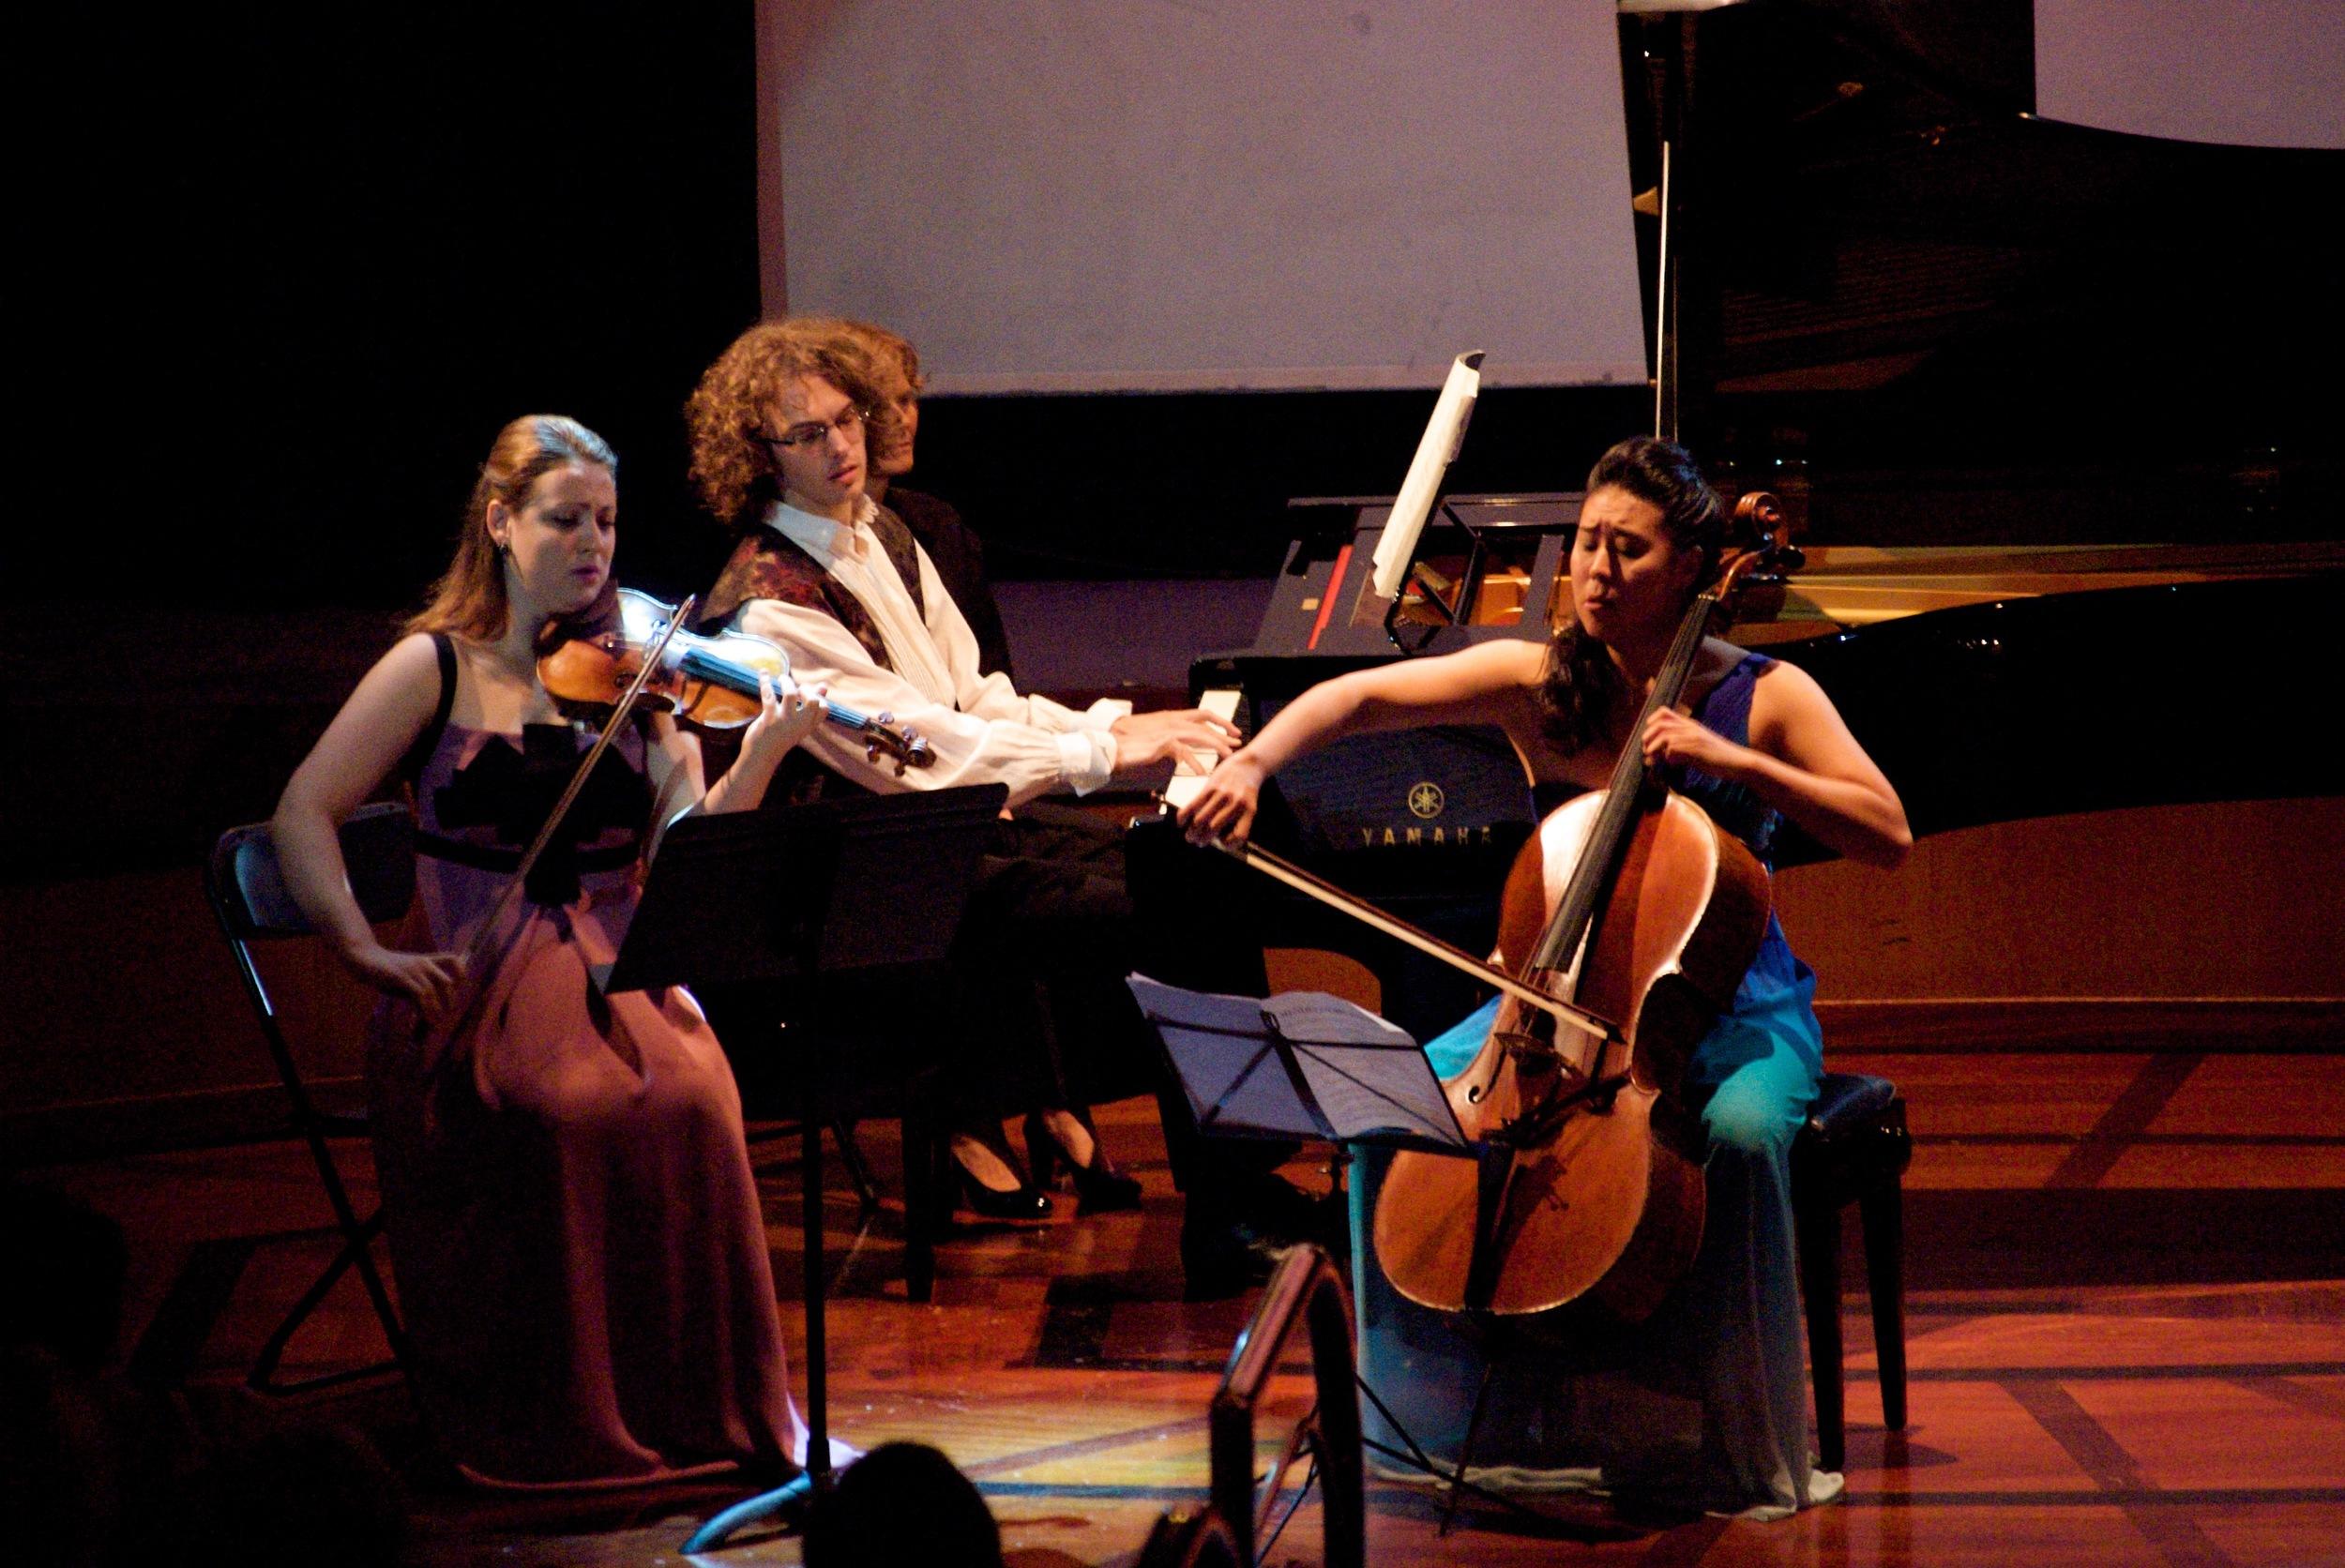 Mendelssohn Piano Trio in D minor with Elina Buksha and Julieen Libeer (2013)